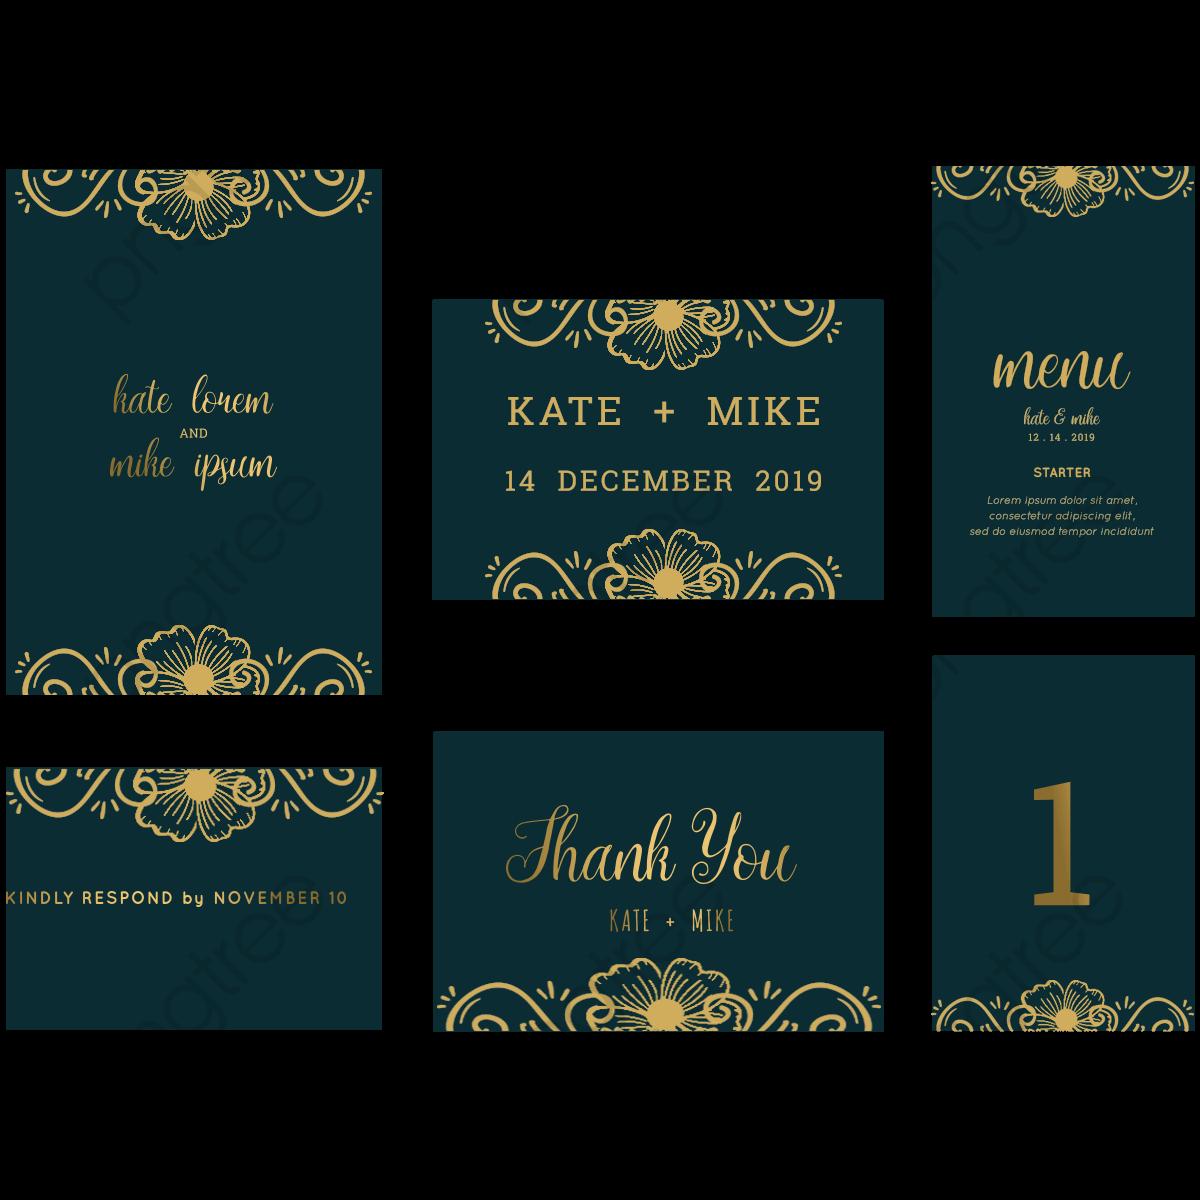 ... Psd Mockup 531861 Blue Floral Wedding Invitation Card Royalty Free Stock Vector 520427 ...